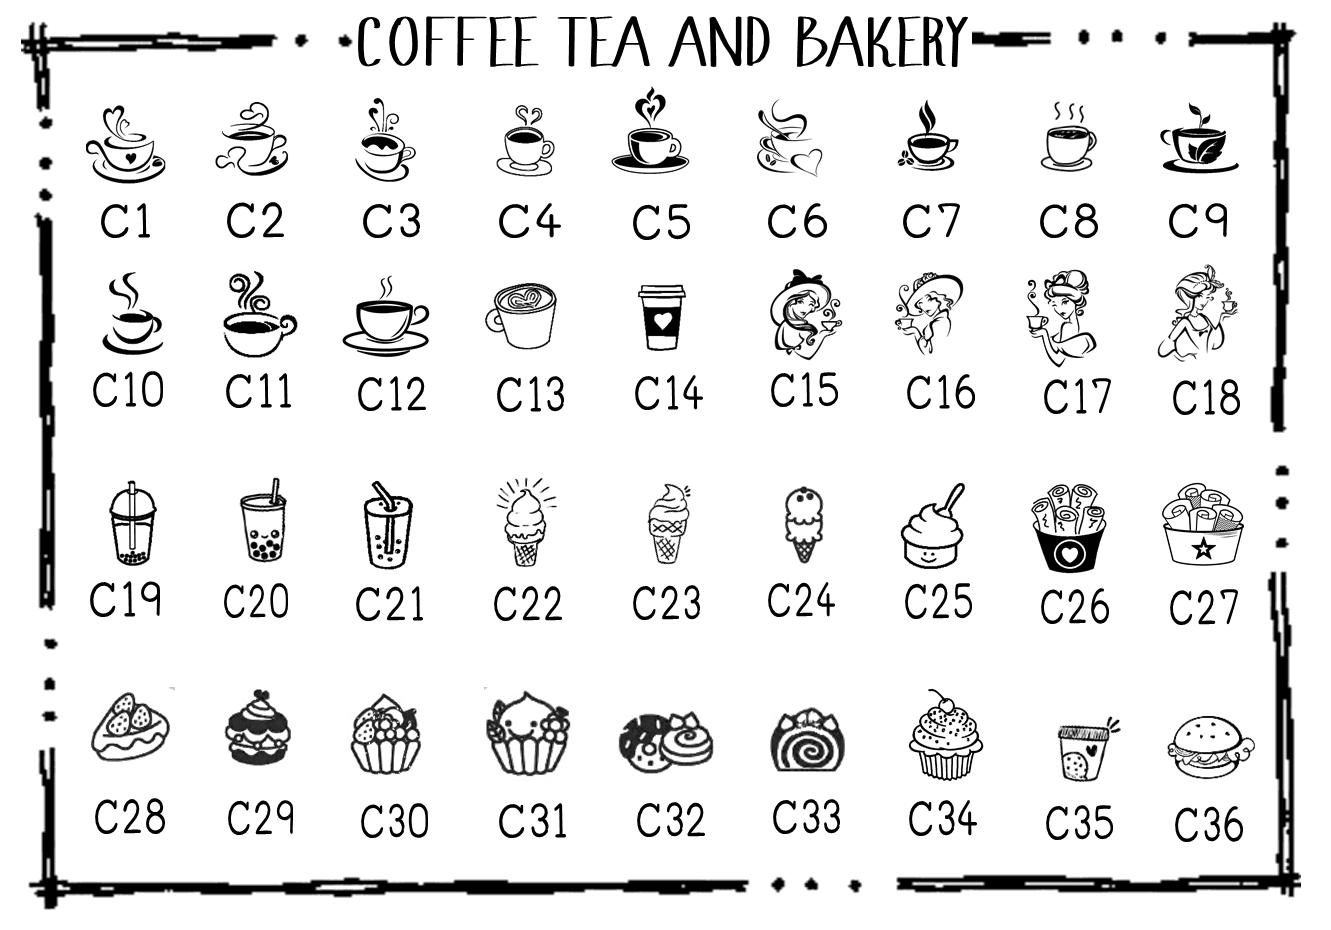 coffee tea and bakery